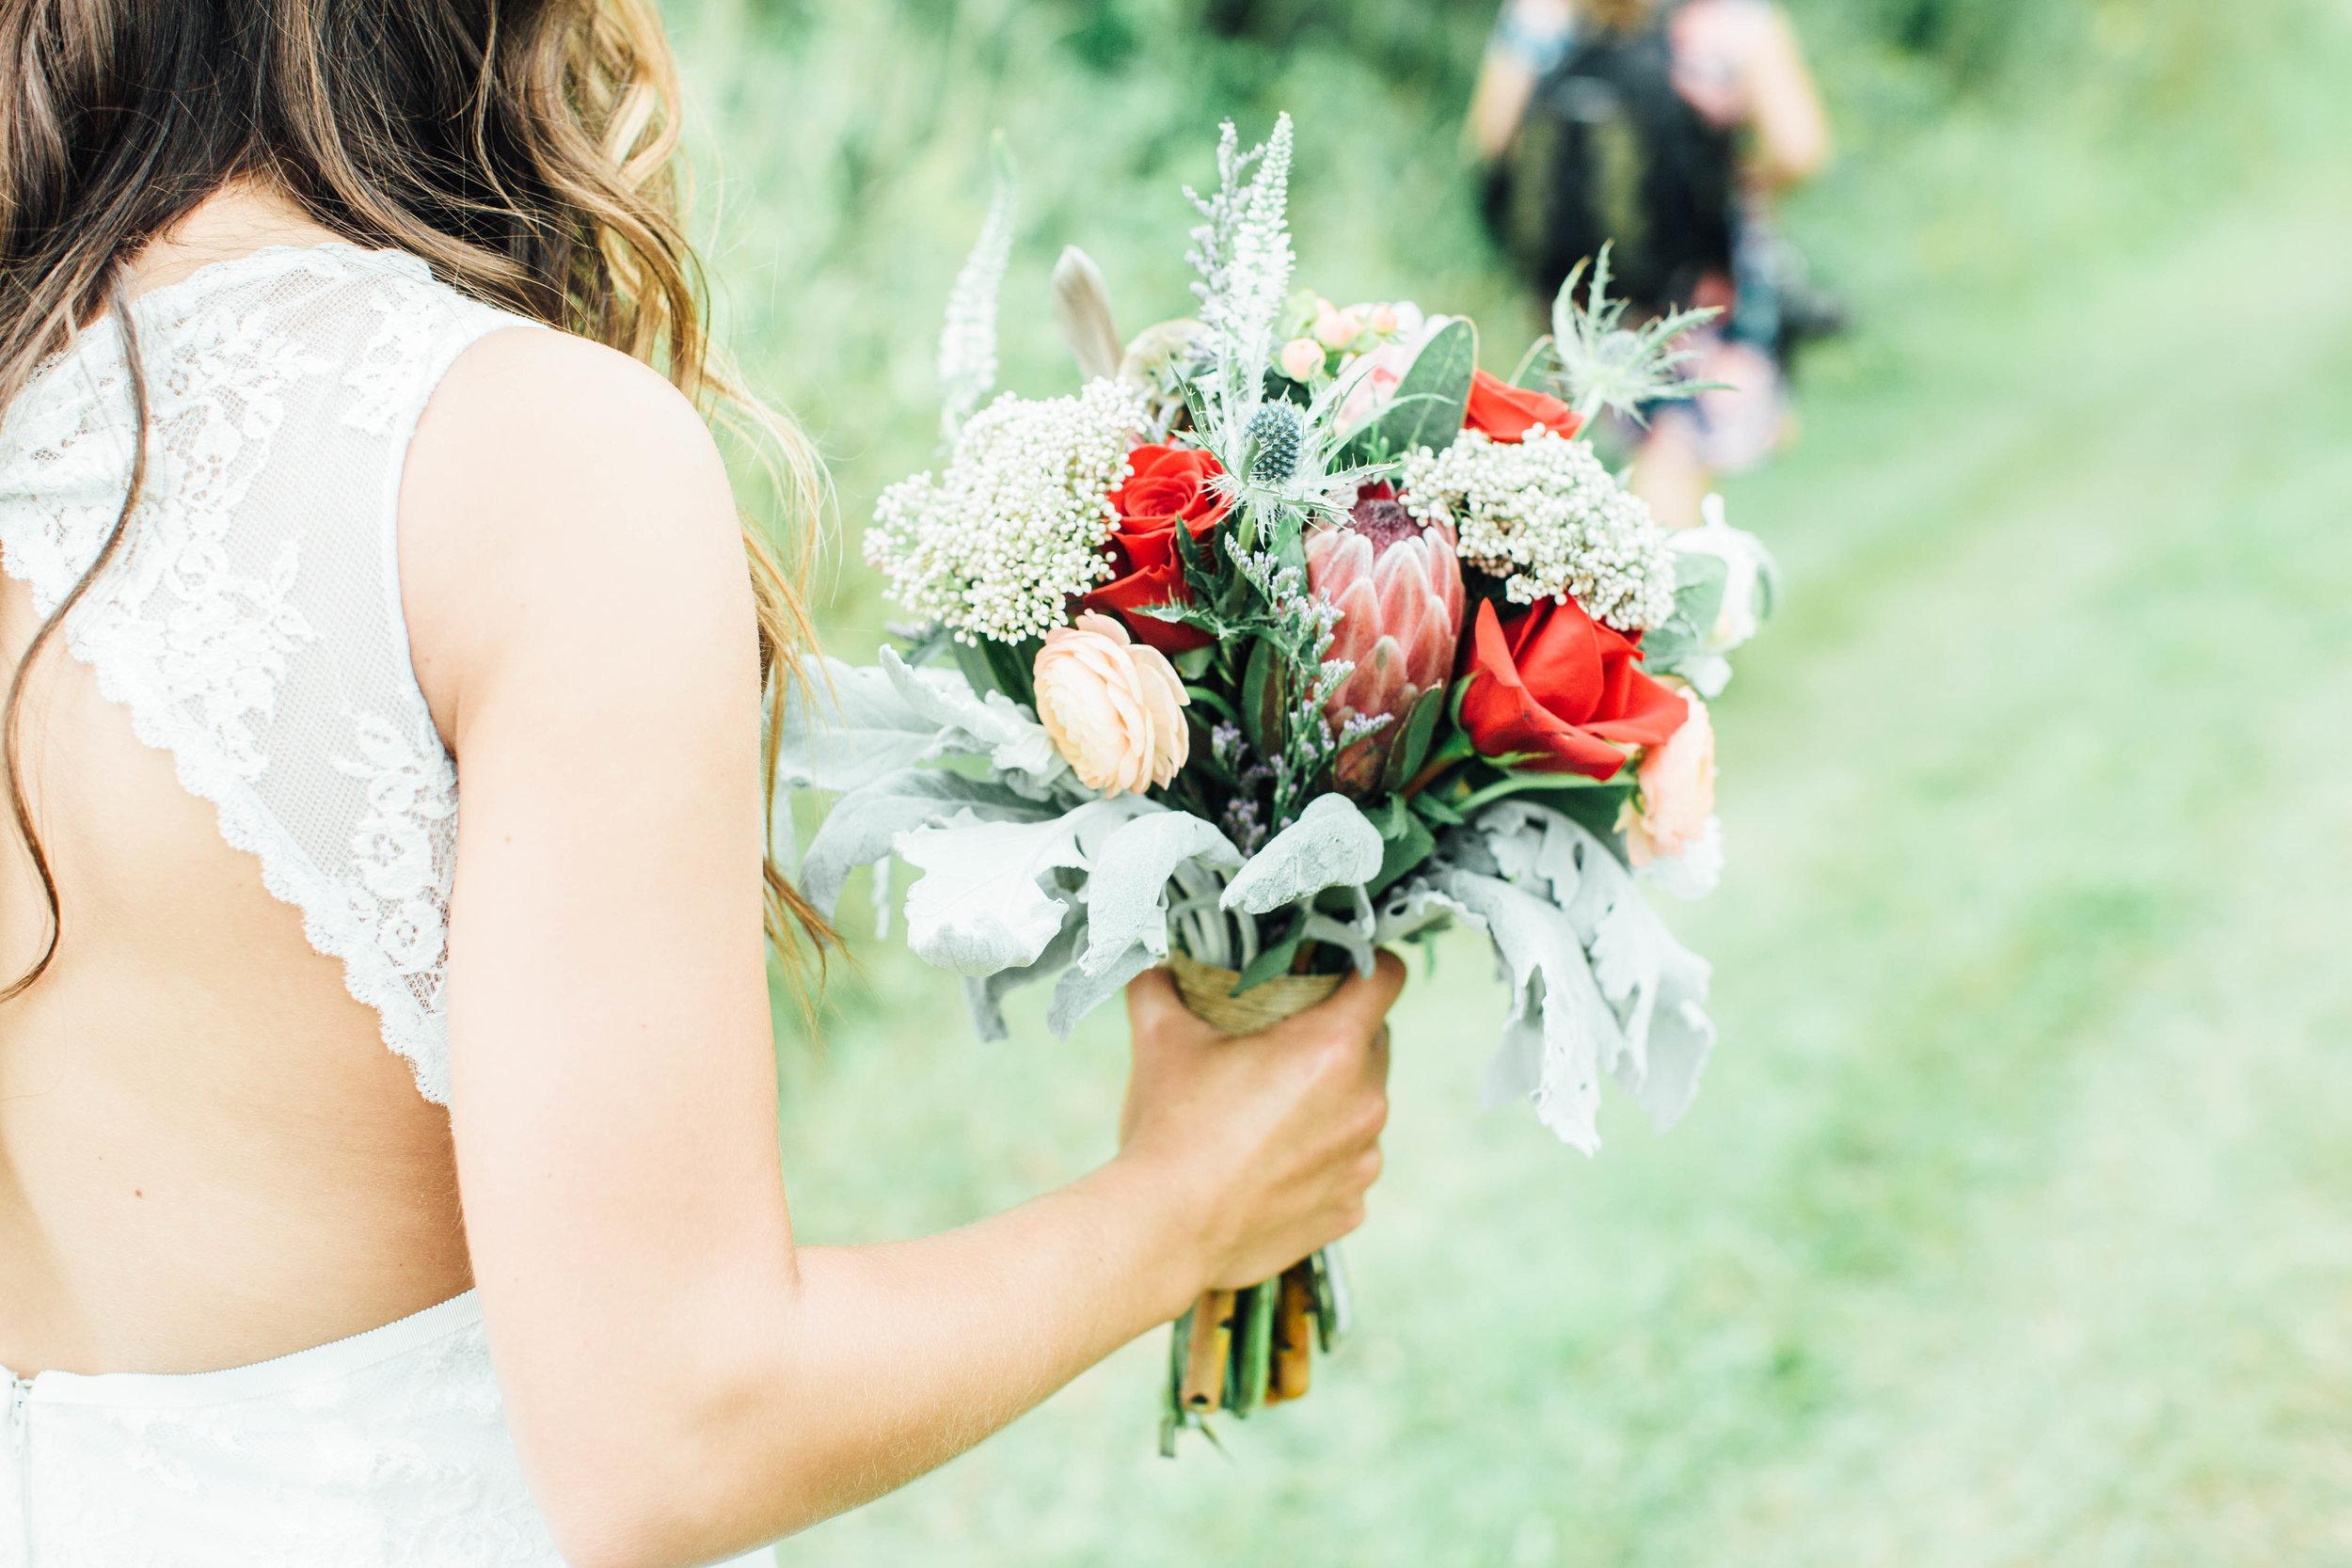 Bohemian Wedding - Sabrina Leigh Studios - Northern Michigan Wedding Photographer039.jpg